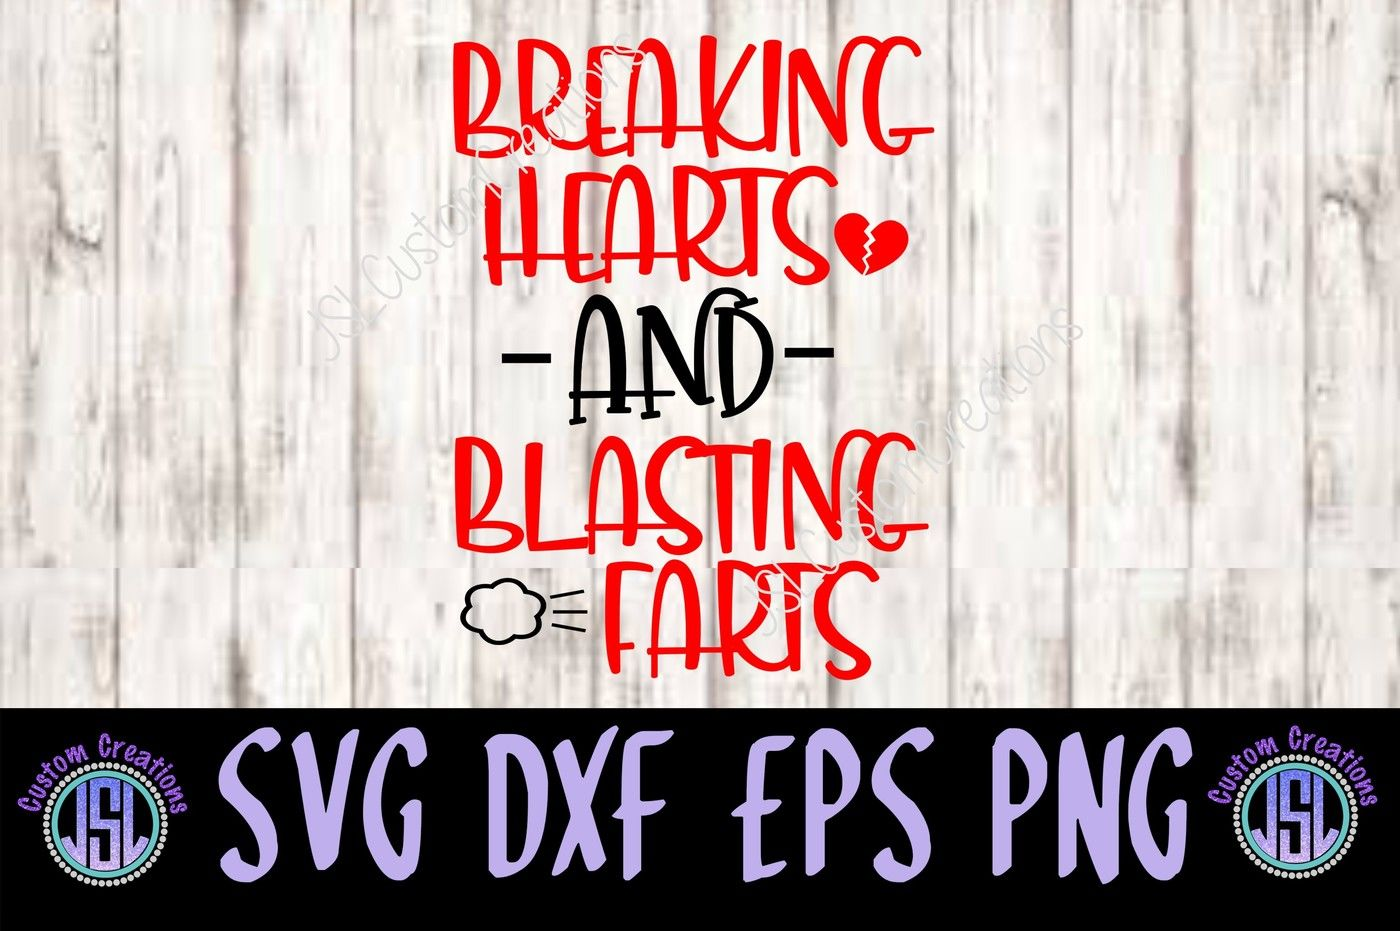 Breaking Hearts Blasting Farts Svg Dxf Eps Png Digital Download